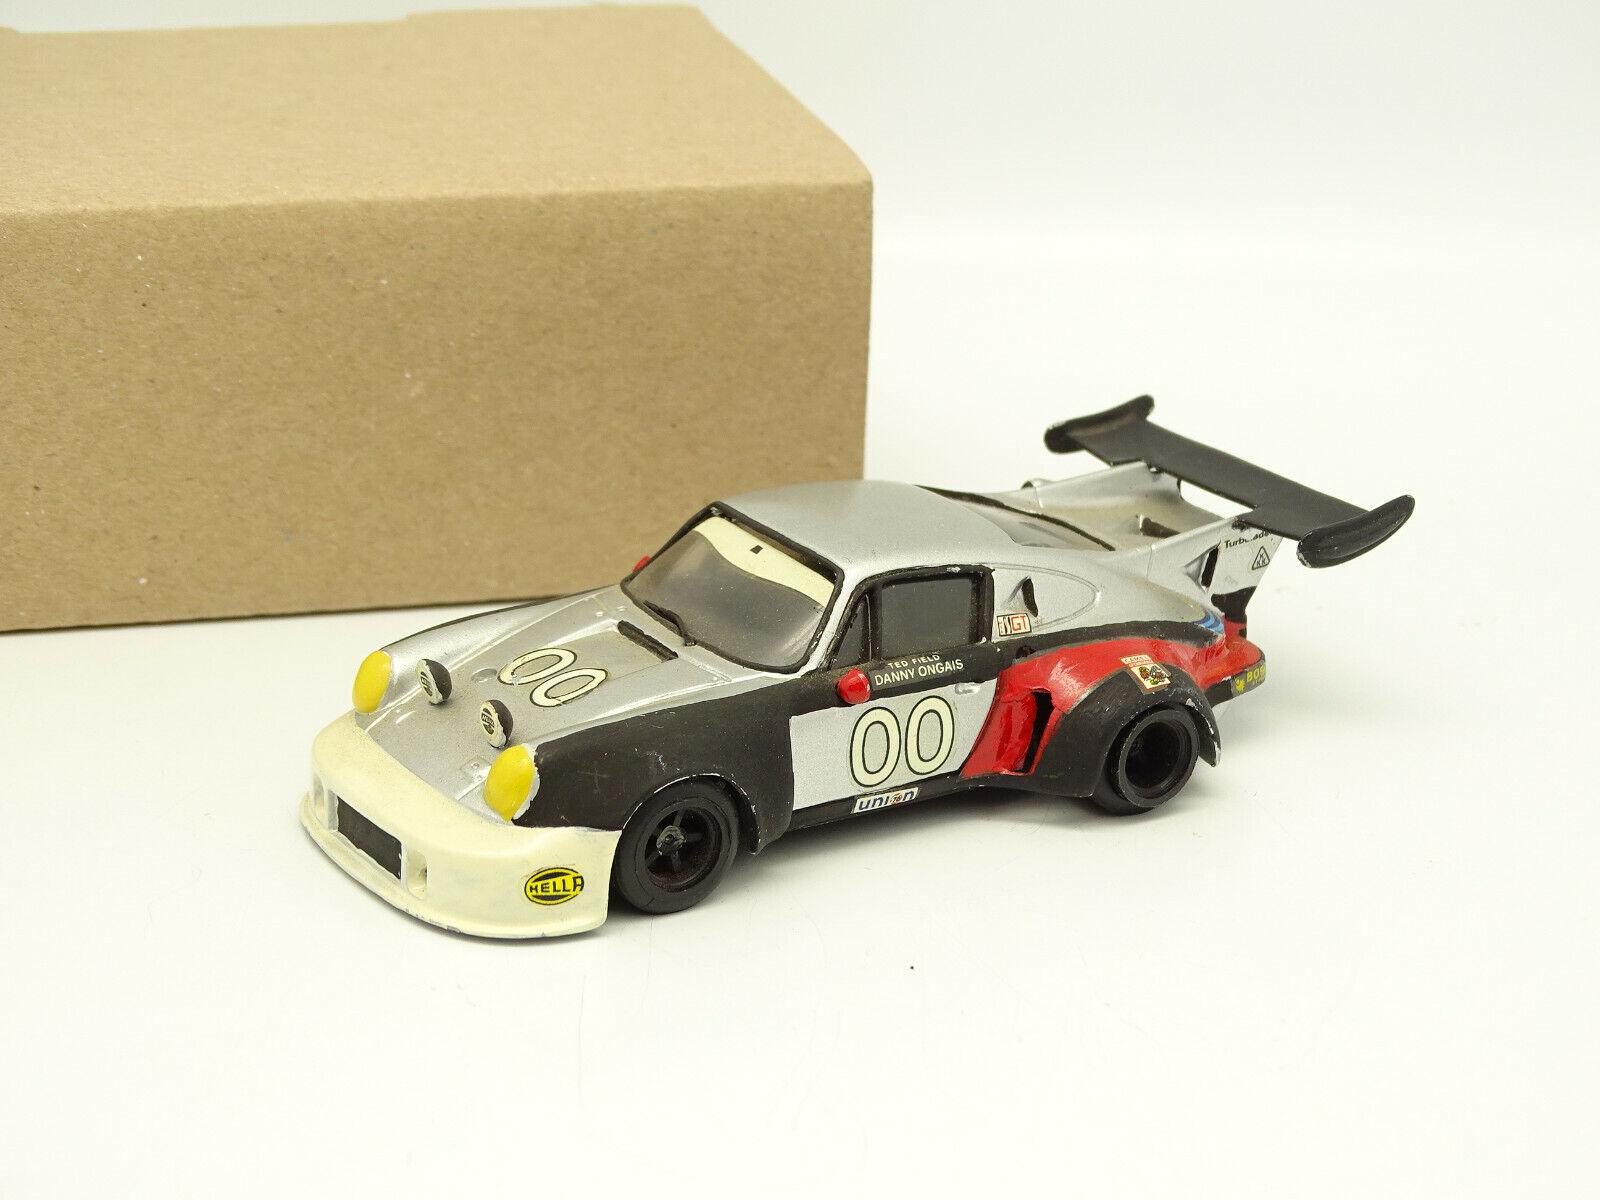 Amr montado Metal Kit 1 1 1   43 - Porsche 911 turbina Daytona 1977 748